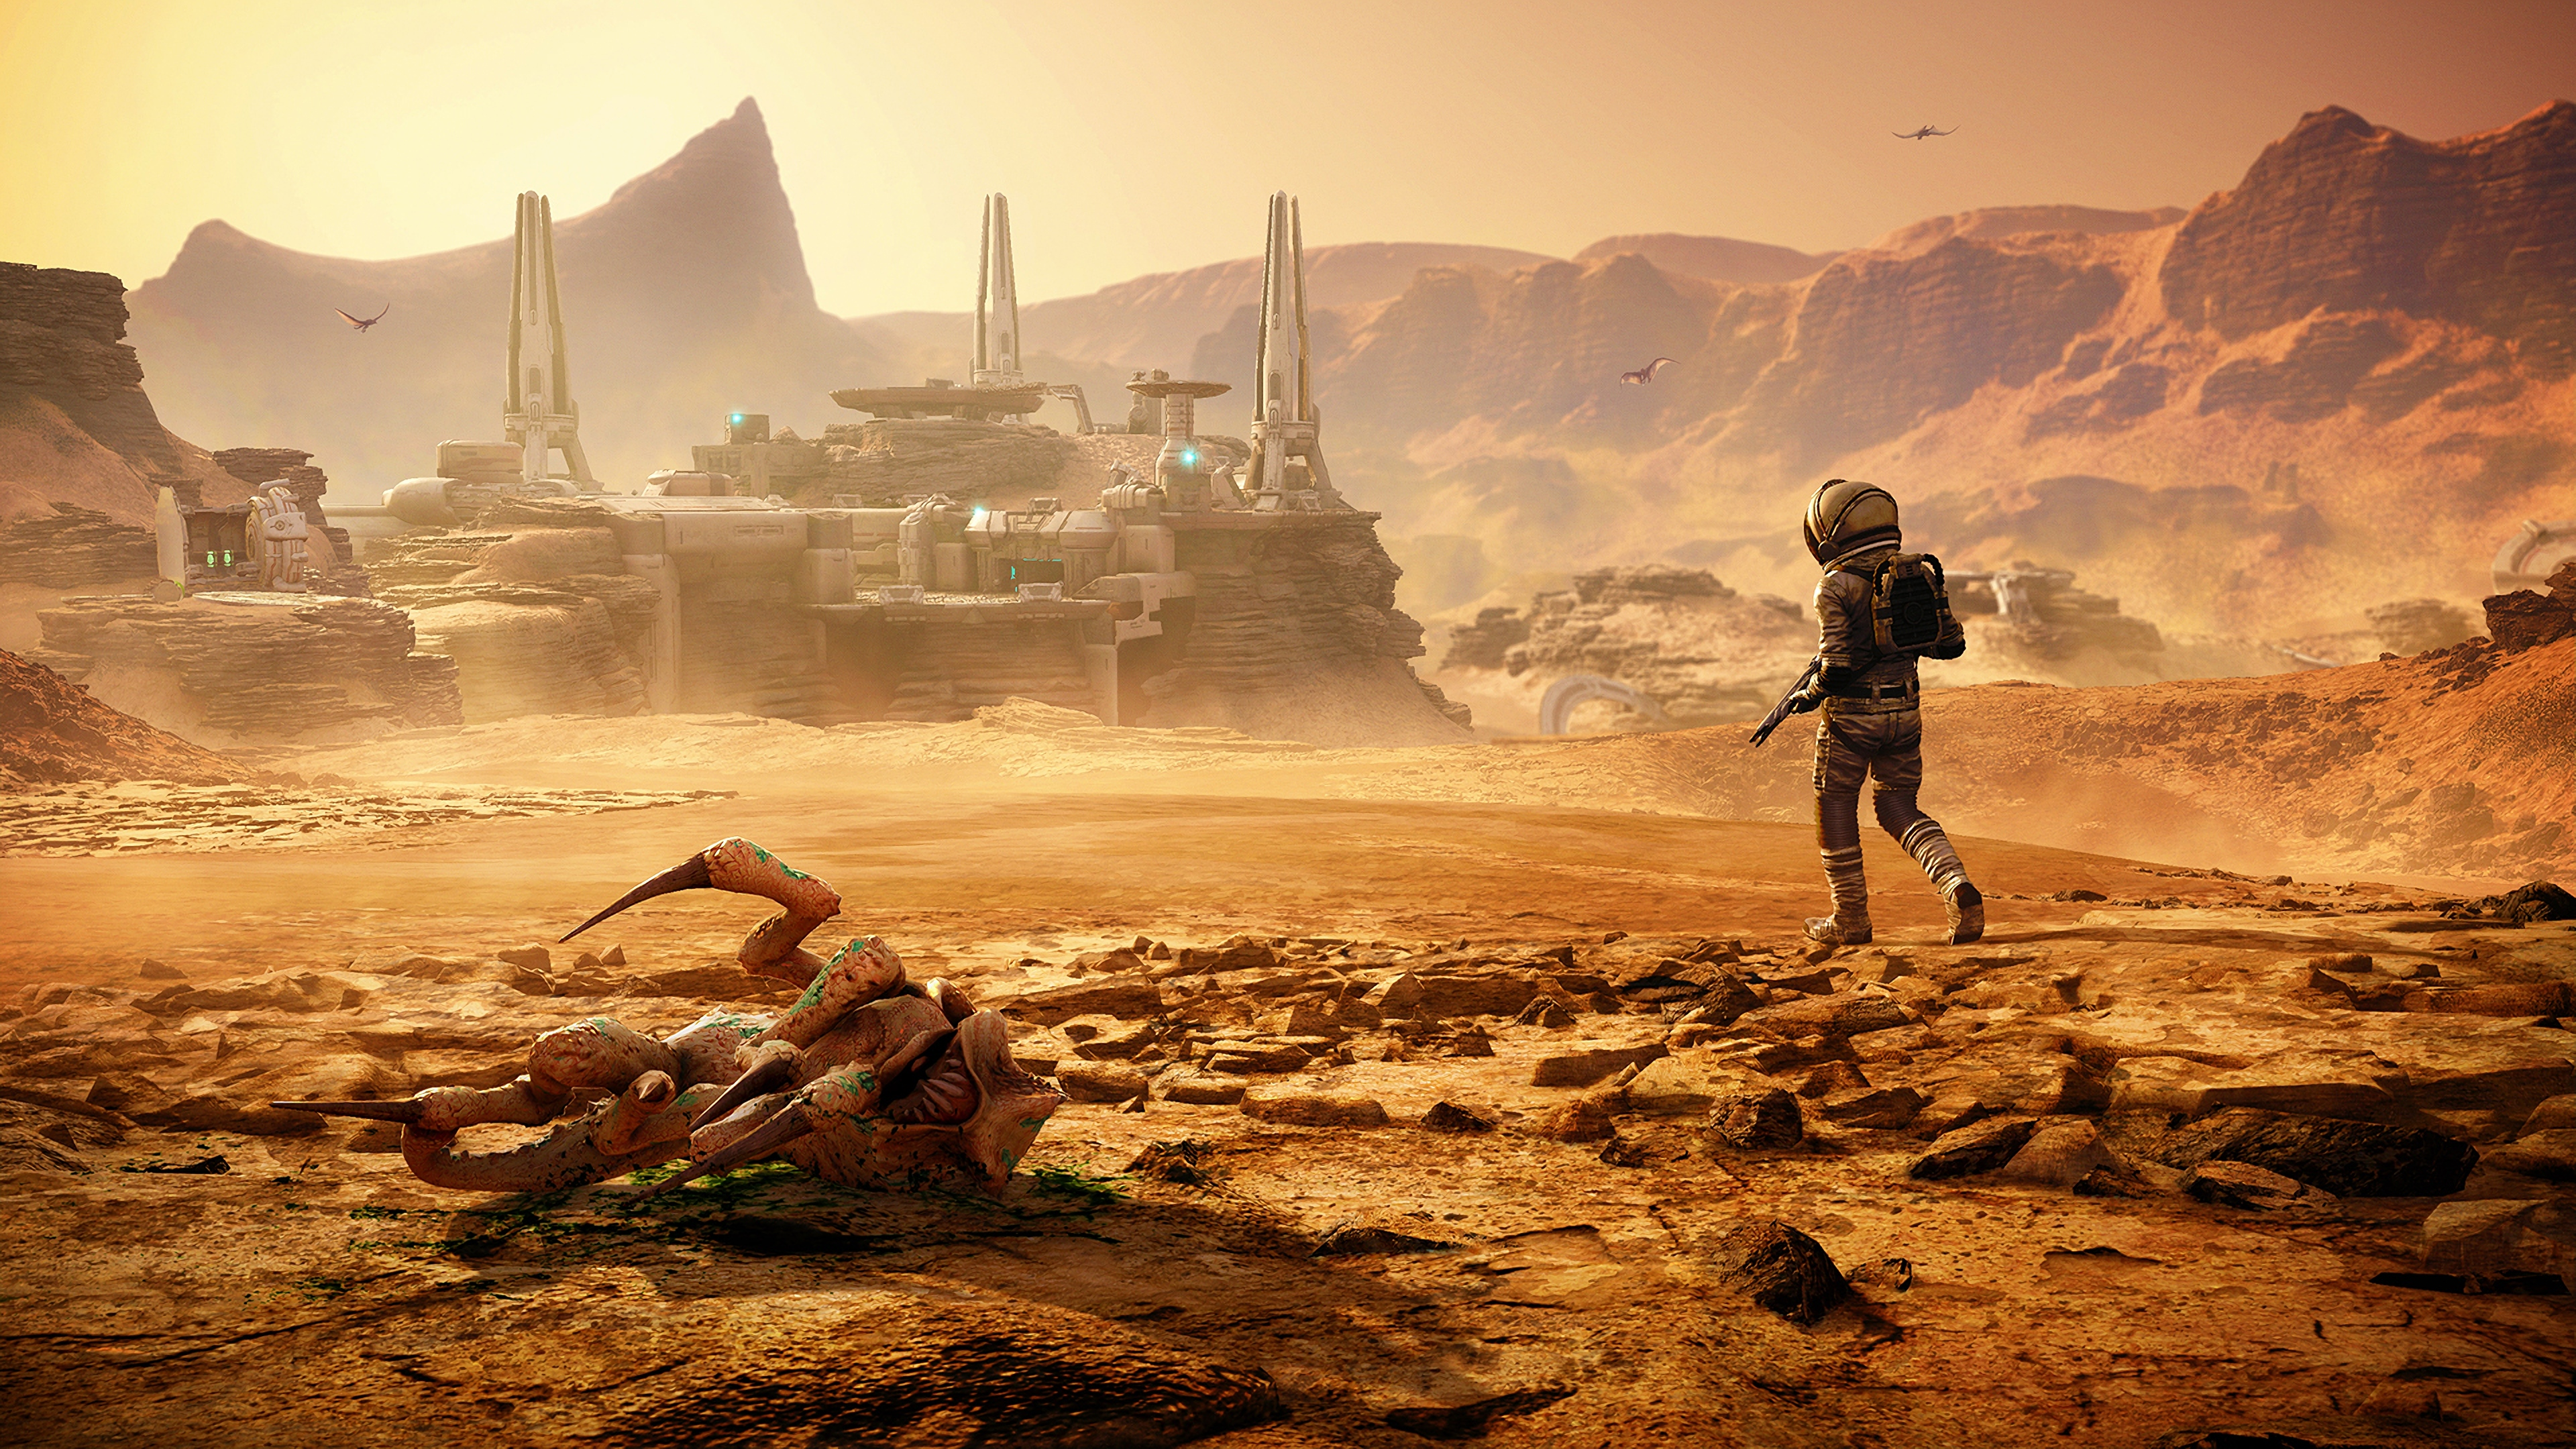 1920x1080 Far Cry 5 Lost On Mars 4k 2018 Laptop Full Hd 1080p Hd